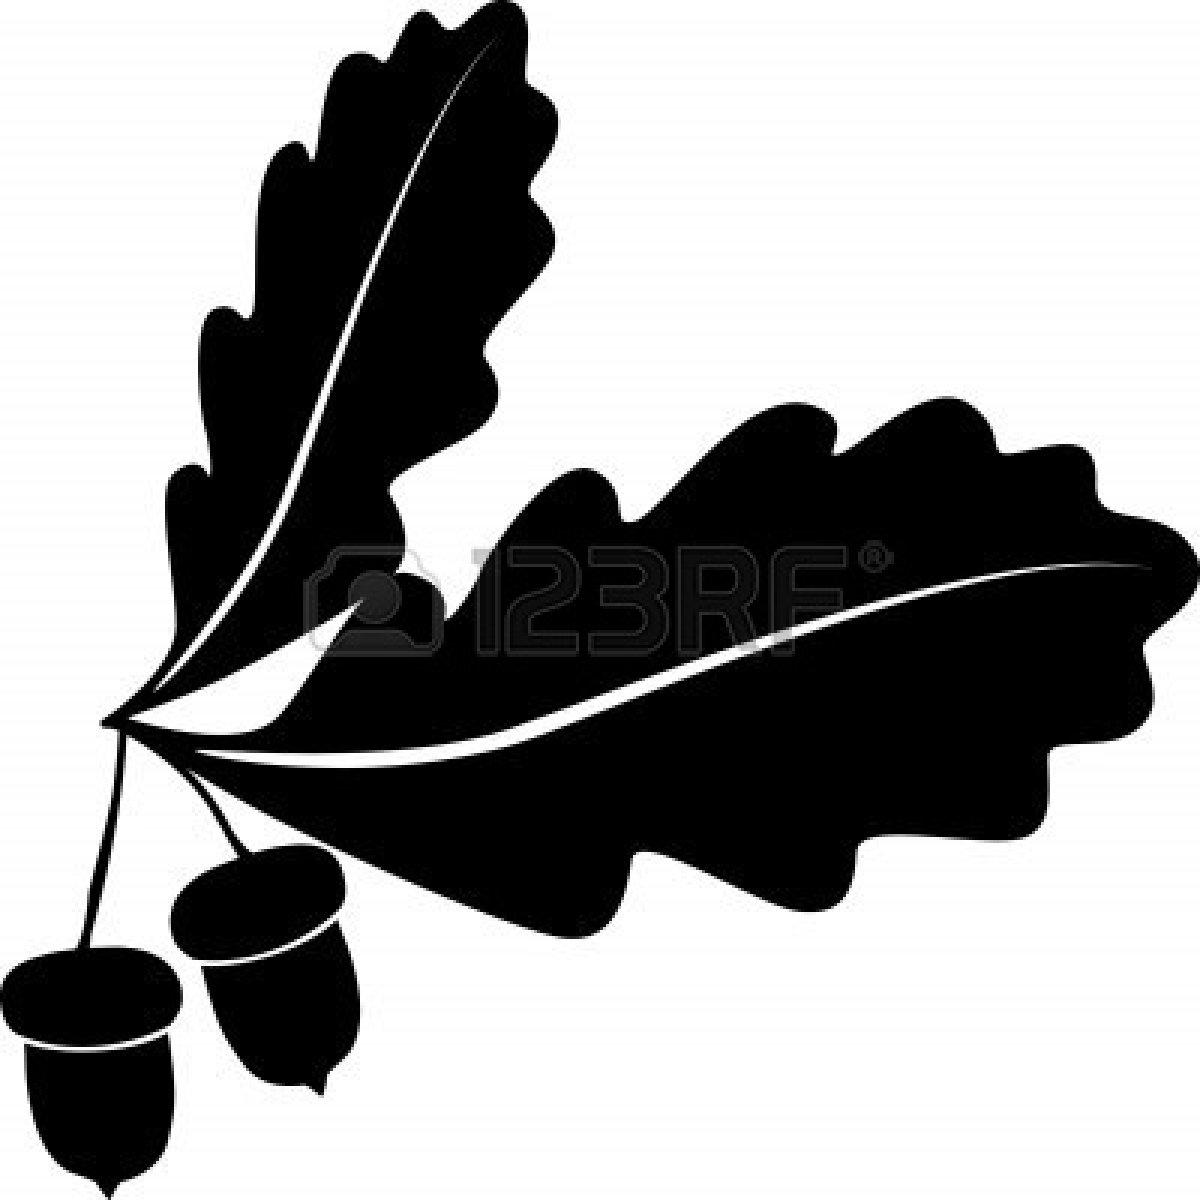 Oak Leaf Silhouette | Clipart Panda - Free Clipart Images